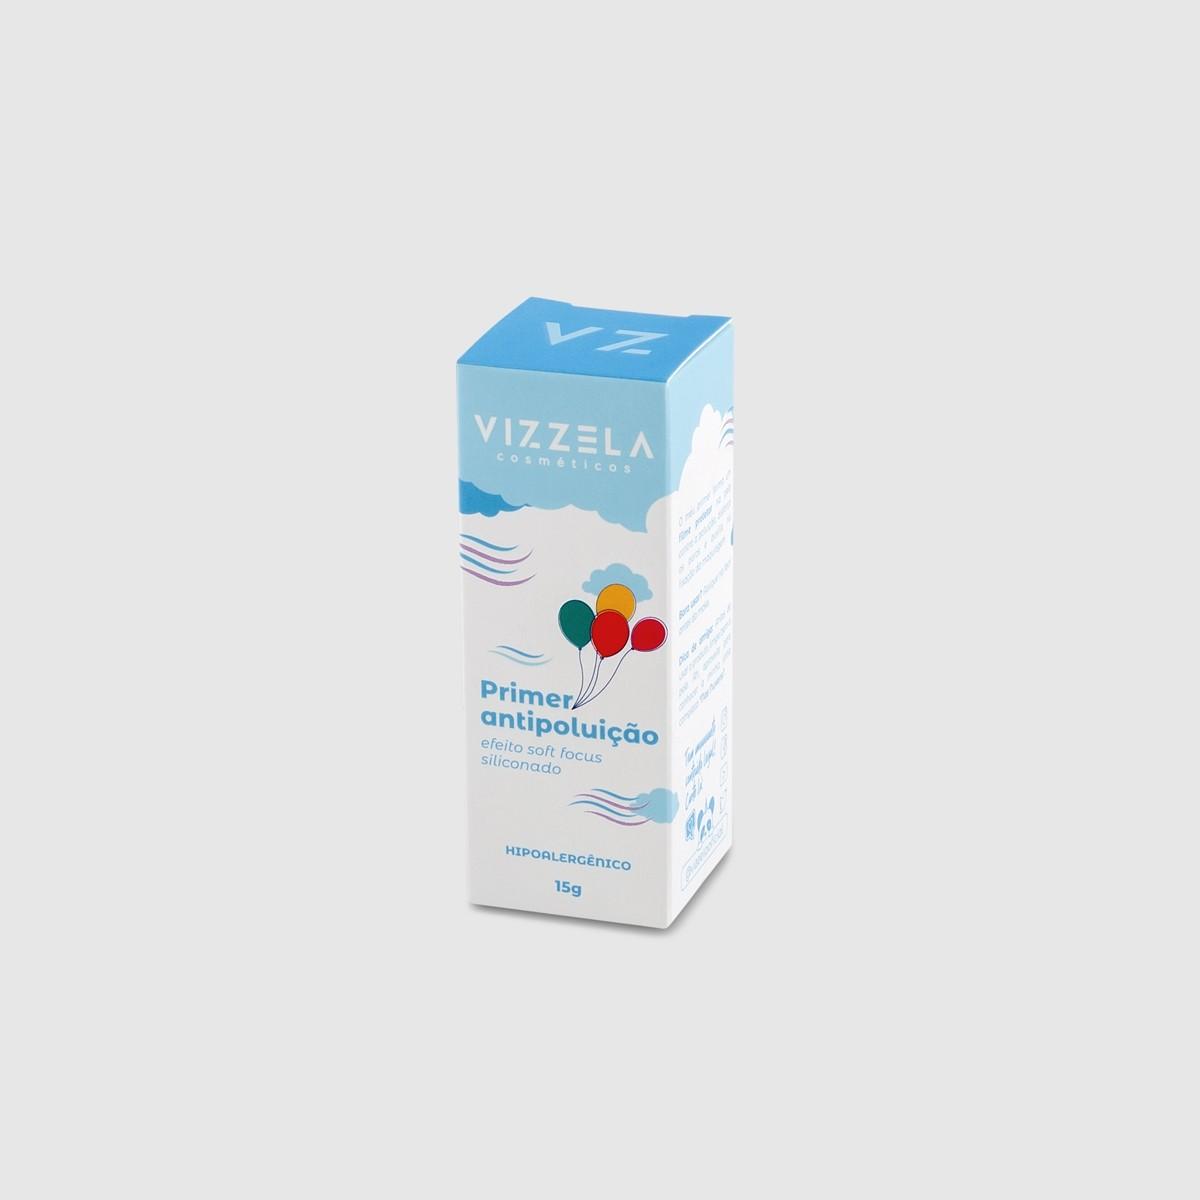 Primer Anti poluição 15g - Vizzela